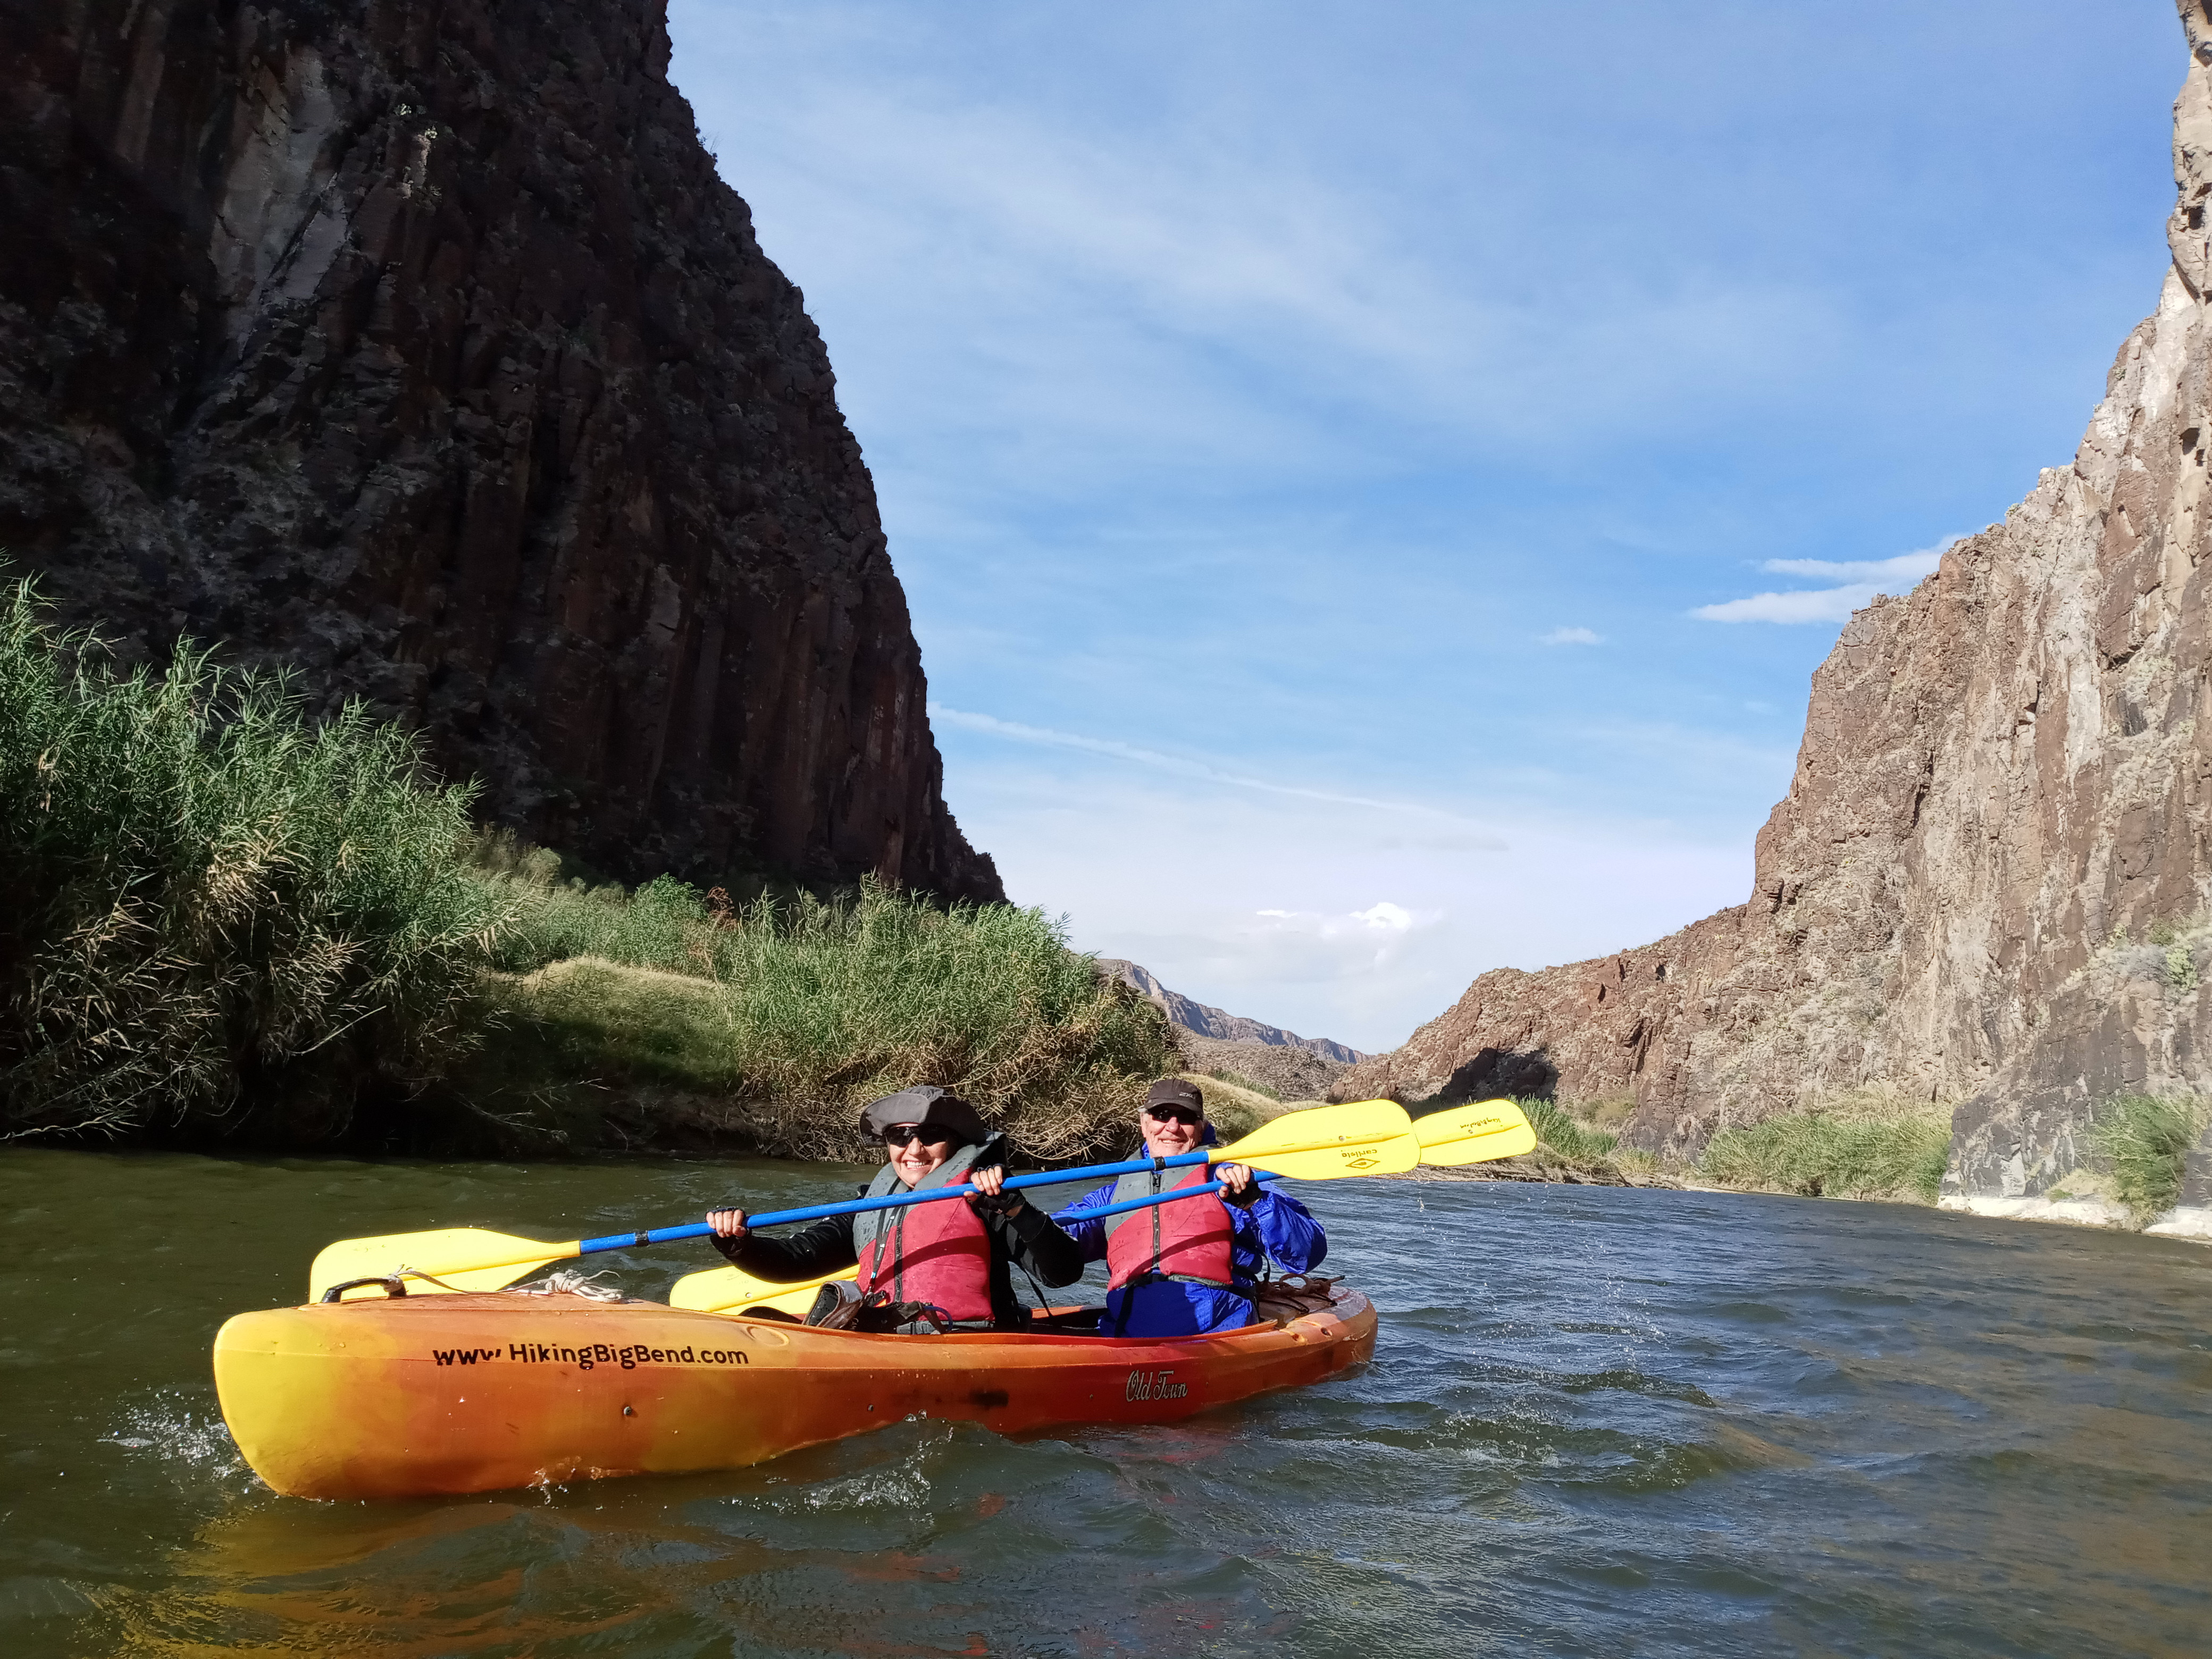 Half-Day River Trip 1:00 p.m.